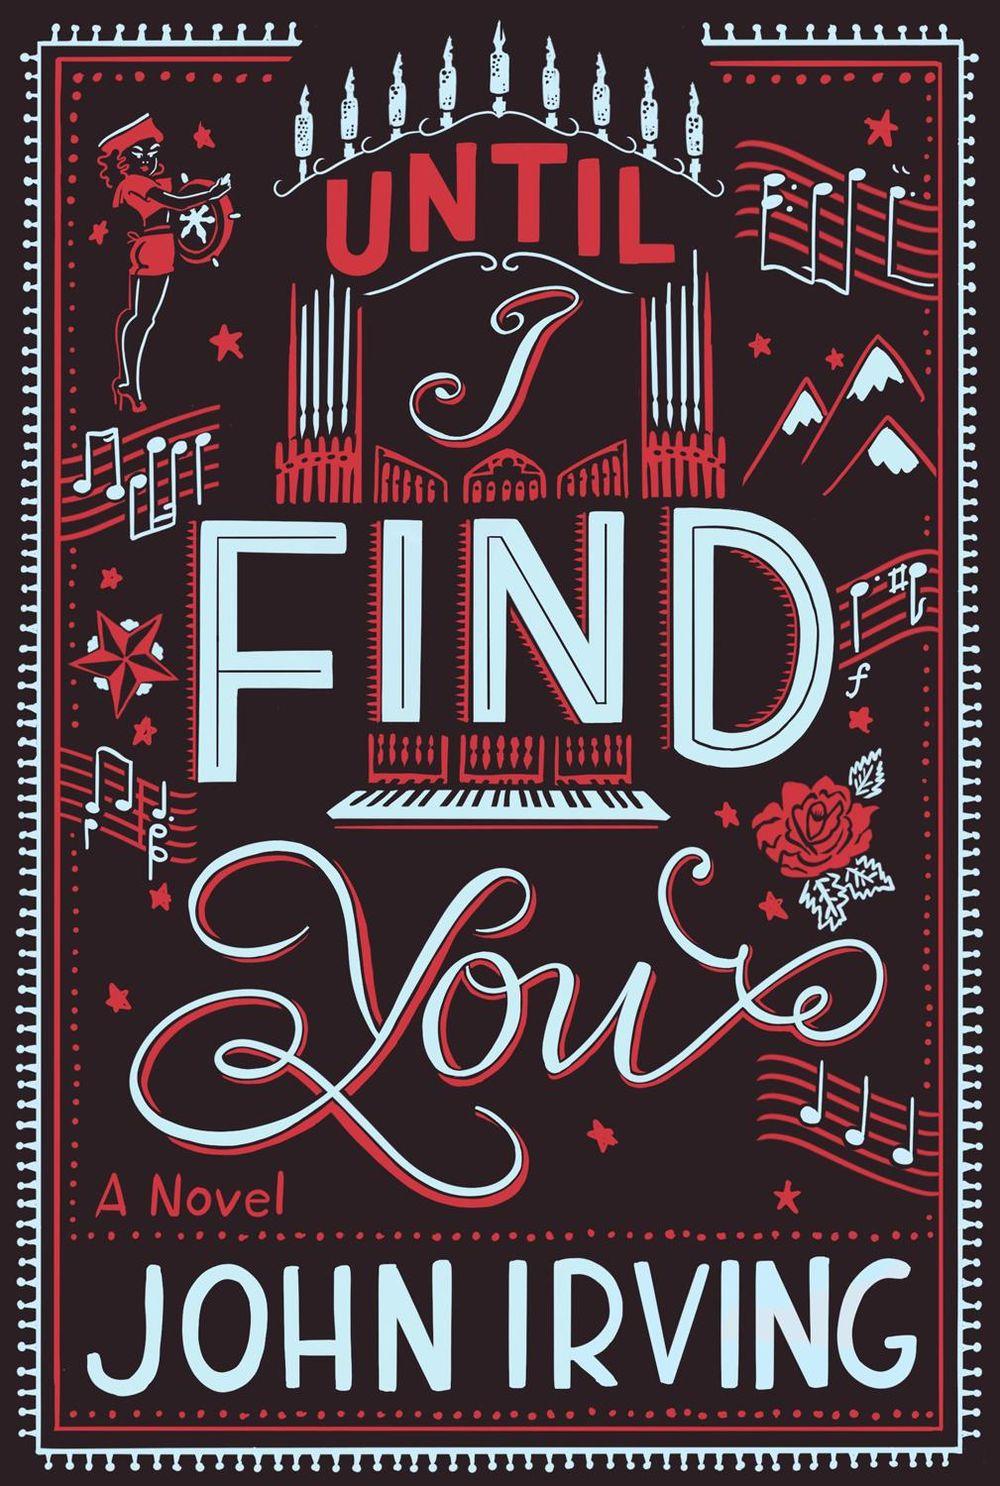 Until I find you - John Irving - image 5 - student project